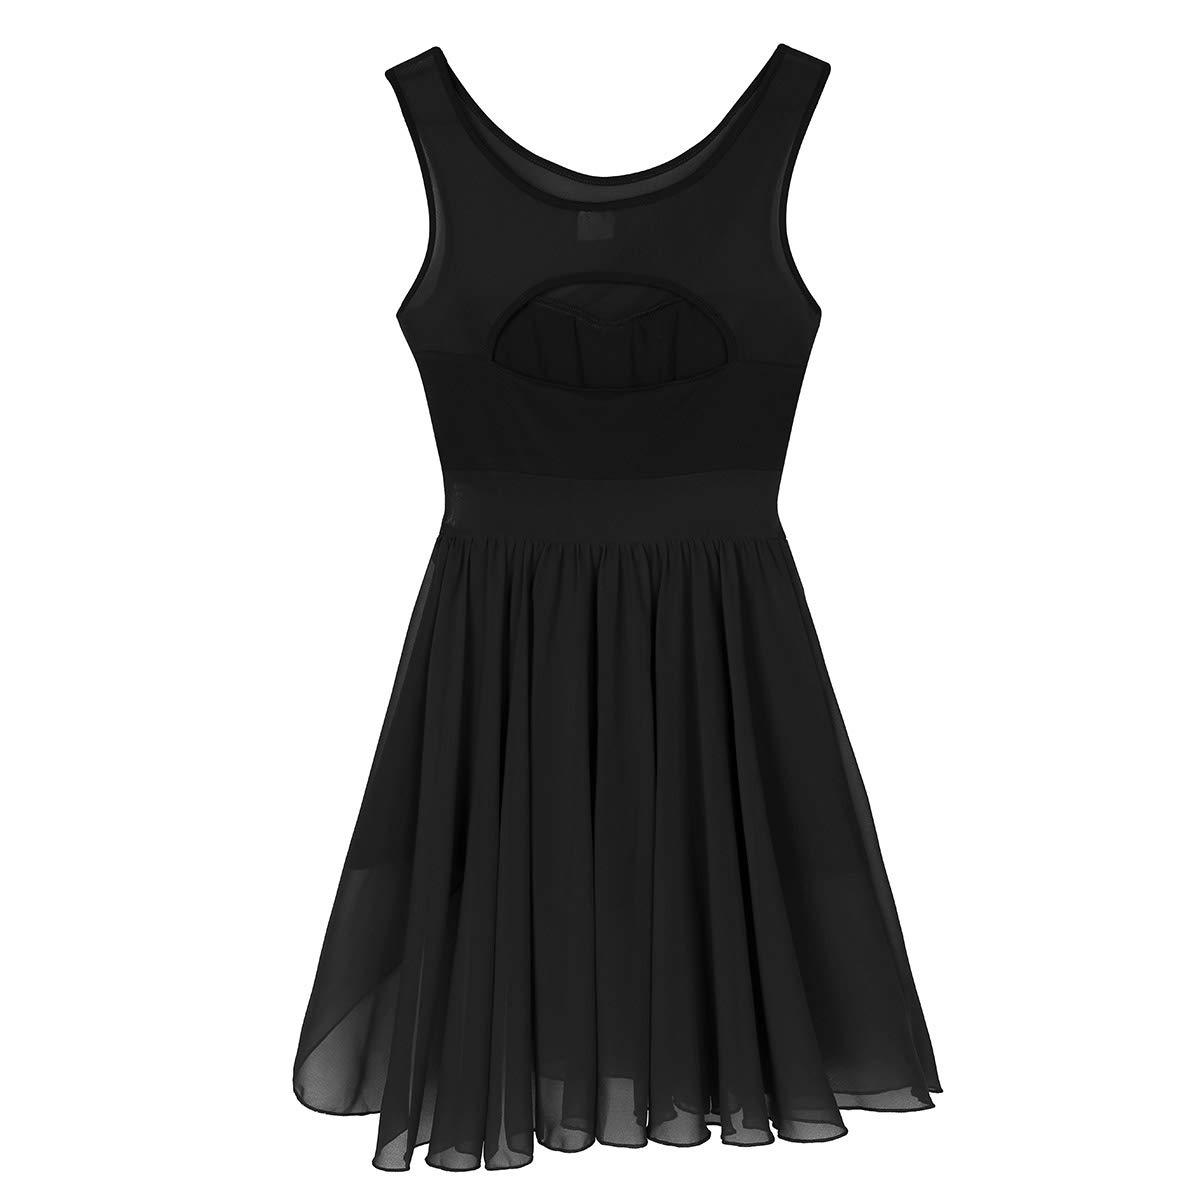 iixpin Women Adult Sleeveless Cut Out Asymmetric Chiffon Stretchy Ballet Dance Gymnastics Leotard Dress